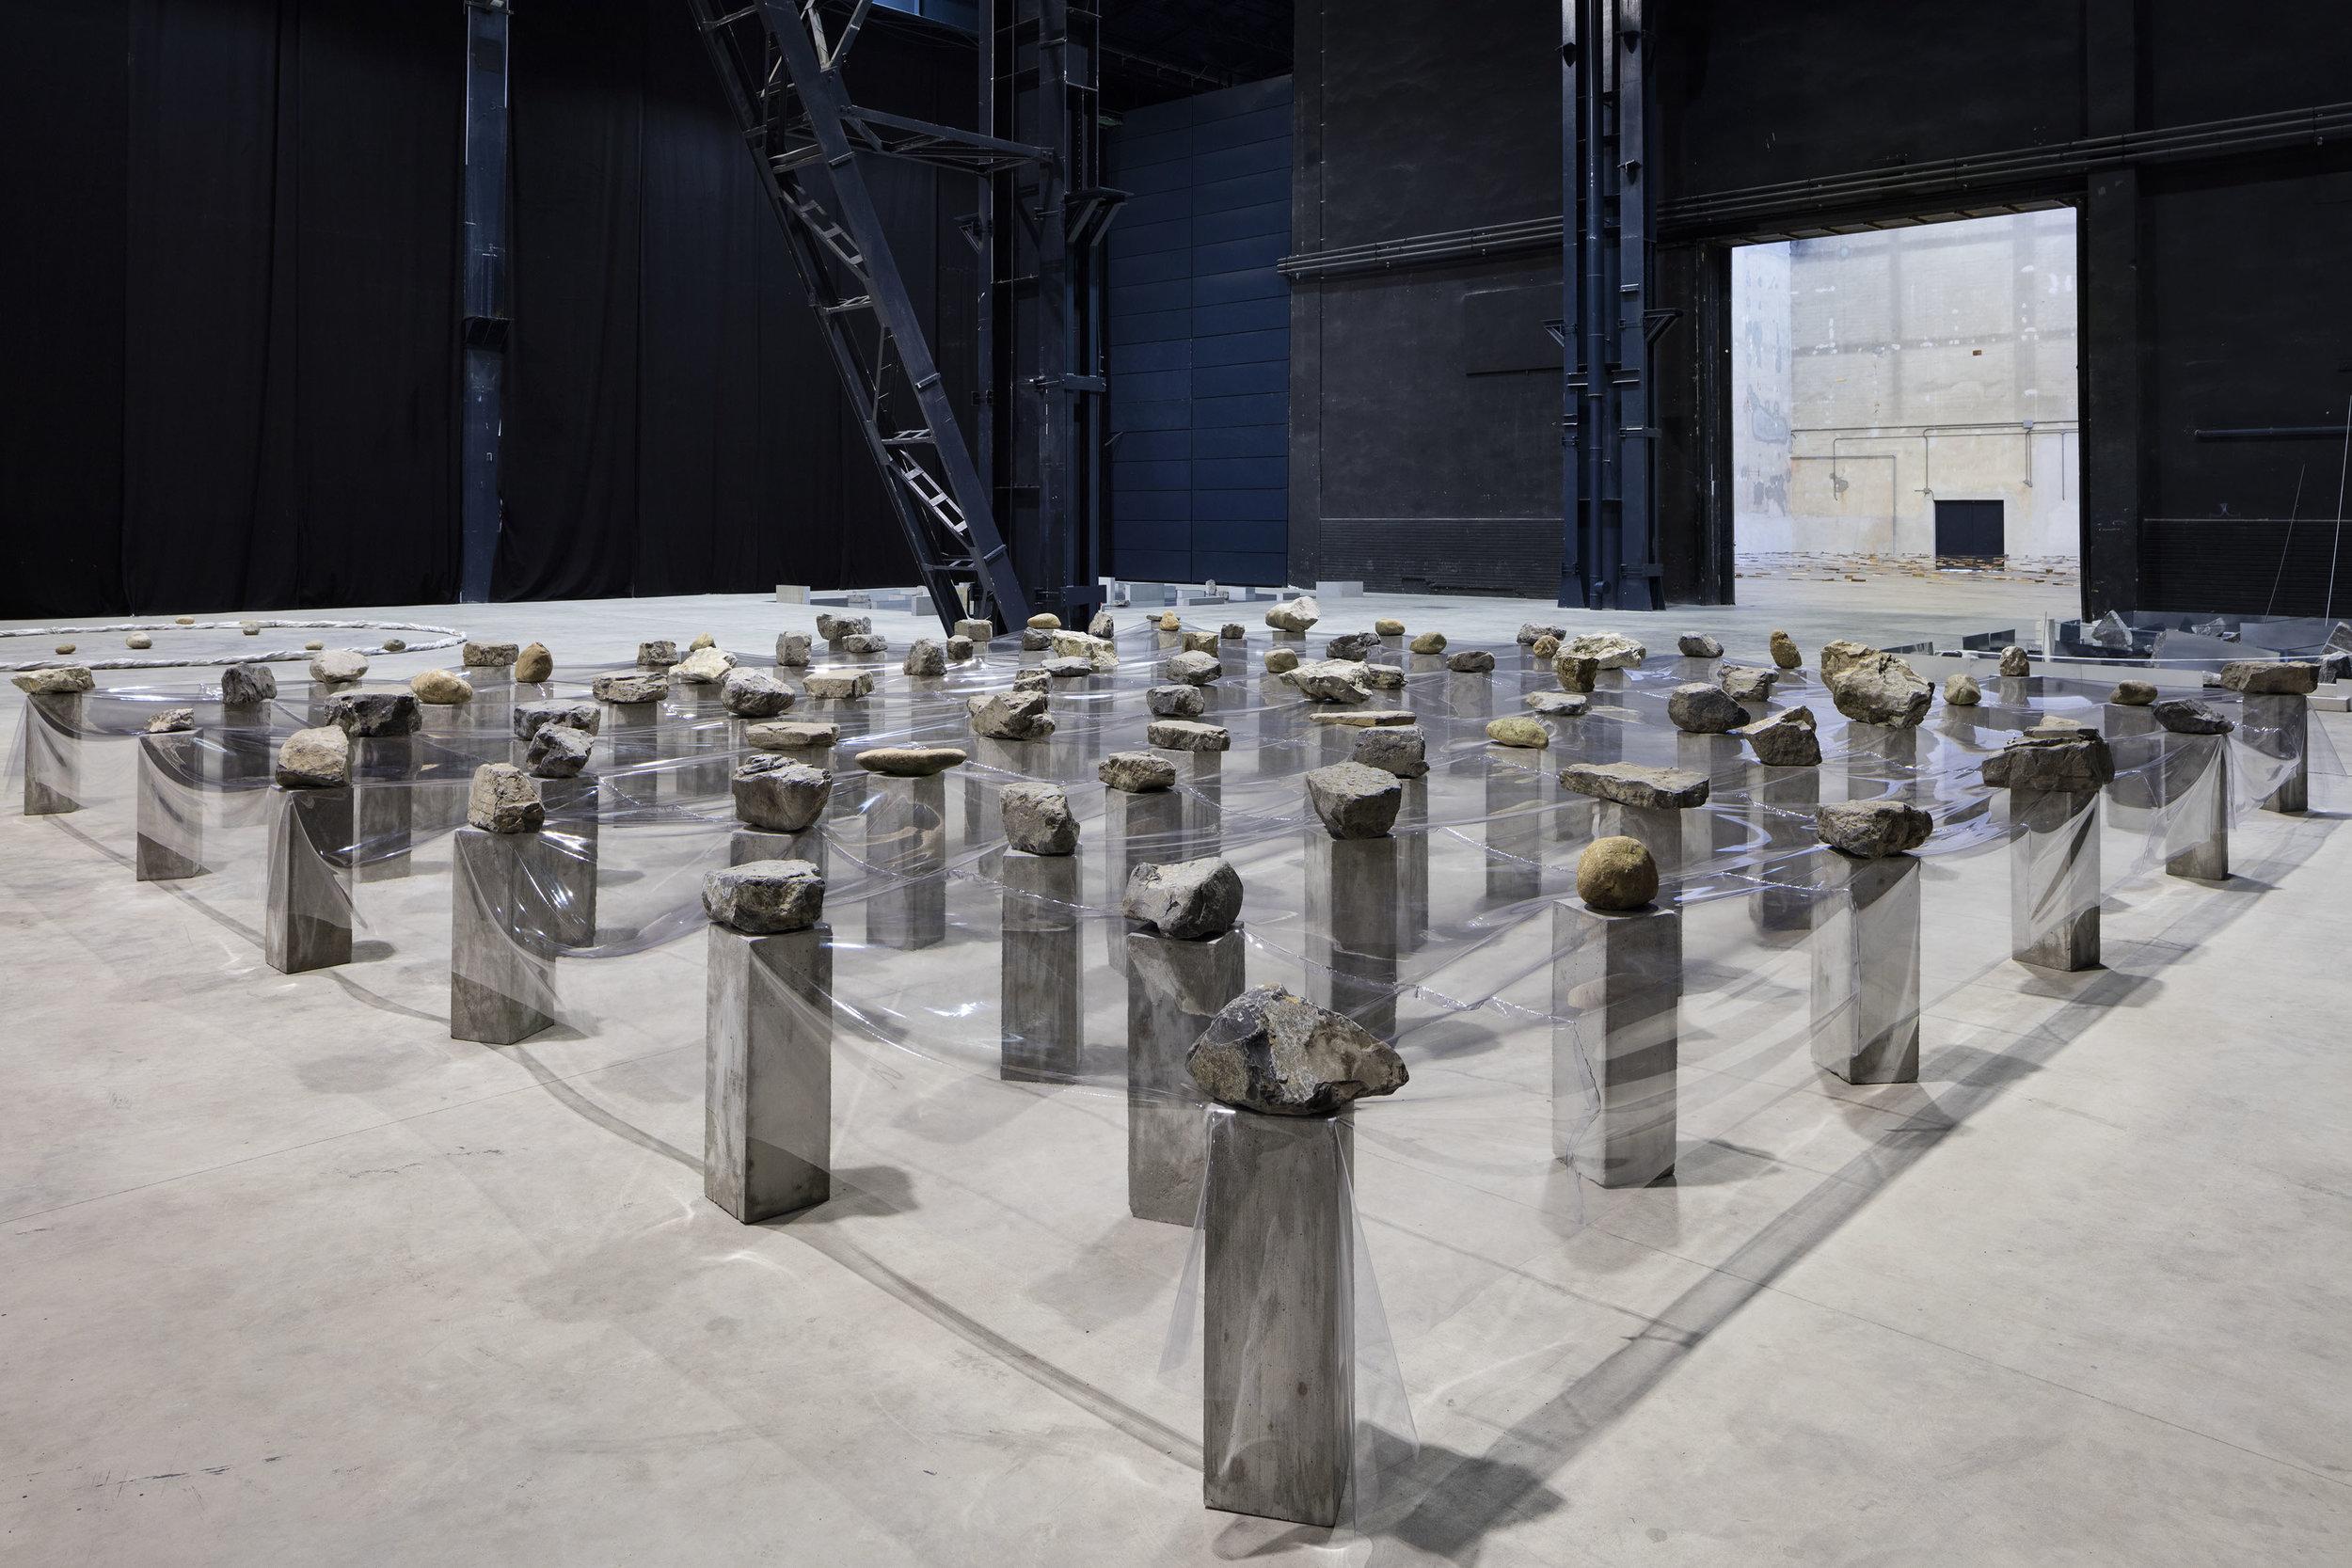 Law of Multitude , 1975/2016 多分律 ( Tabunritsu ) Plastic sheet, stone, concrete 100 x 875 x 850 cm Installation view, Kishio Suga: Situations , Pirelli HangarBicocca, Milan, 2016 Photo: Agostino Osio; Courtesy Pirelli HangarBicocca, Milan